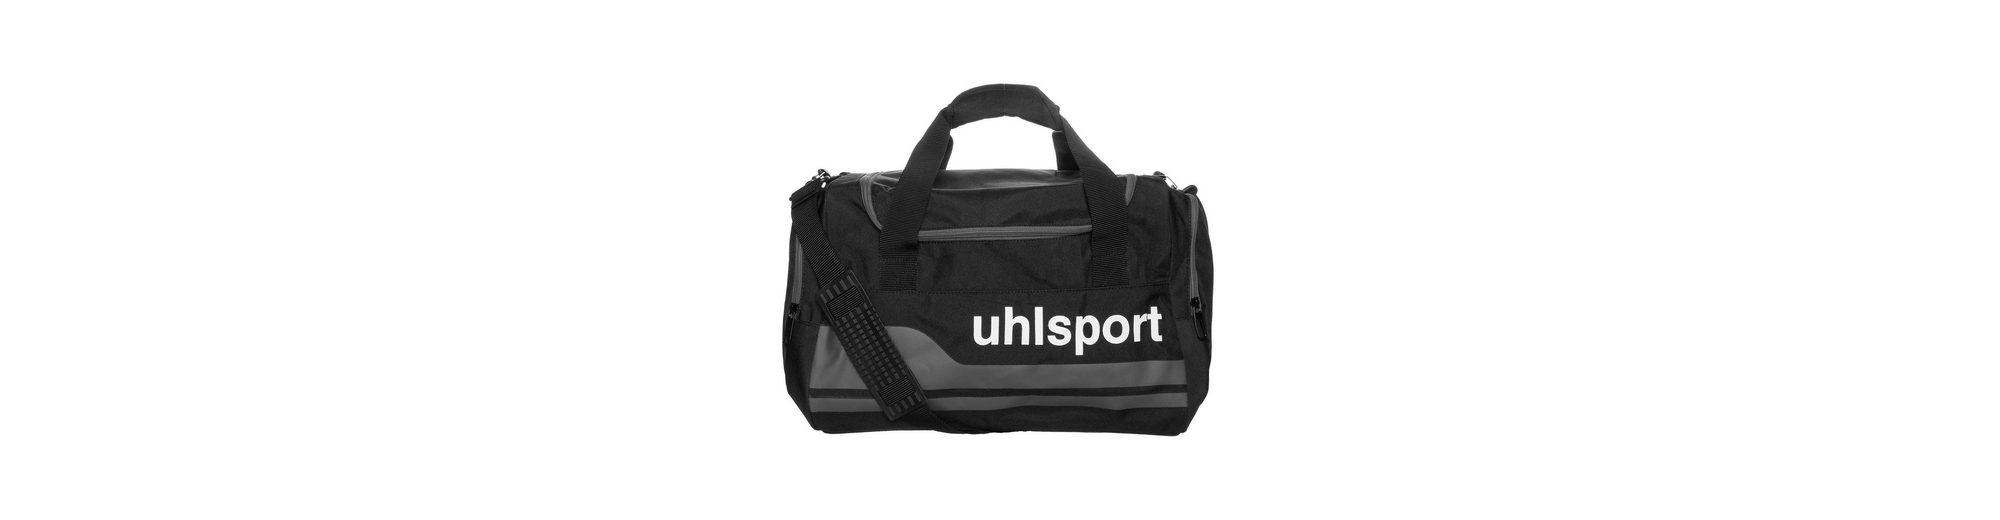 UHLSPORT Basic Line 2.0 30 L Sporttasche S